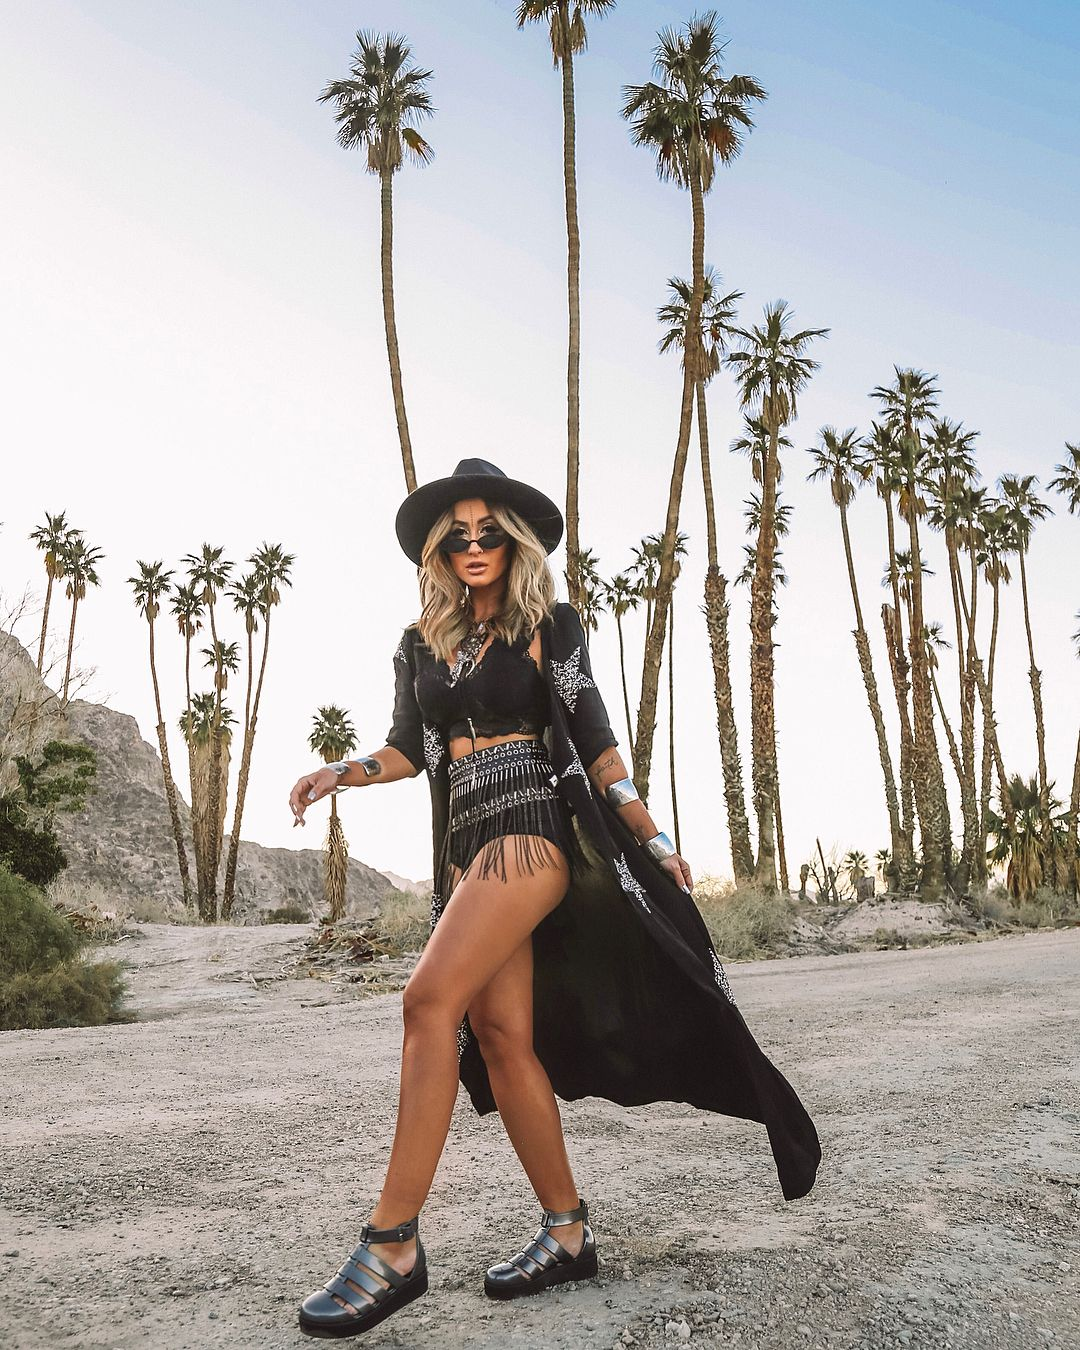 ce74f9490 Look Coachella, Micheli Fernandes, look preto, casaco preto estampa  estrelas, bota metalizada cano curto, chapéu preto, franjas, looks  festivais,